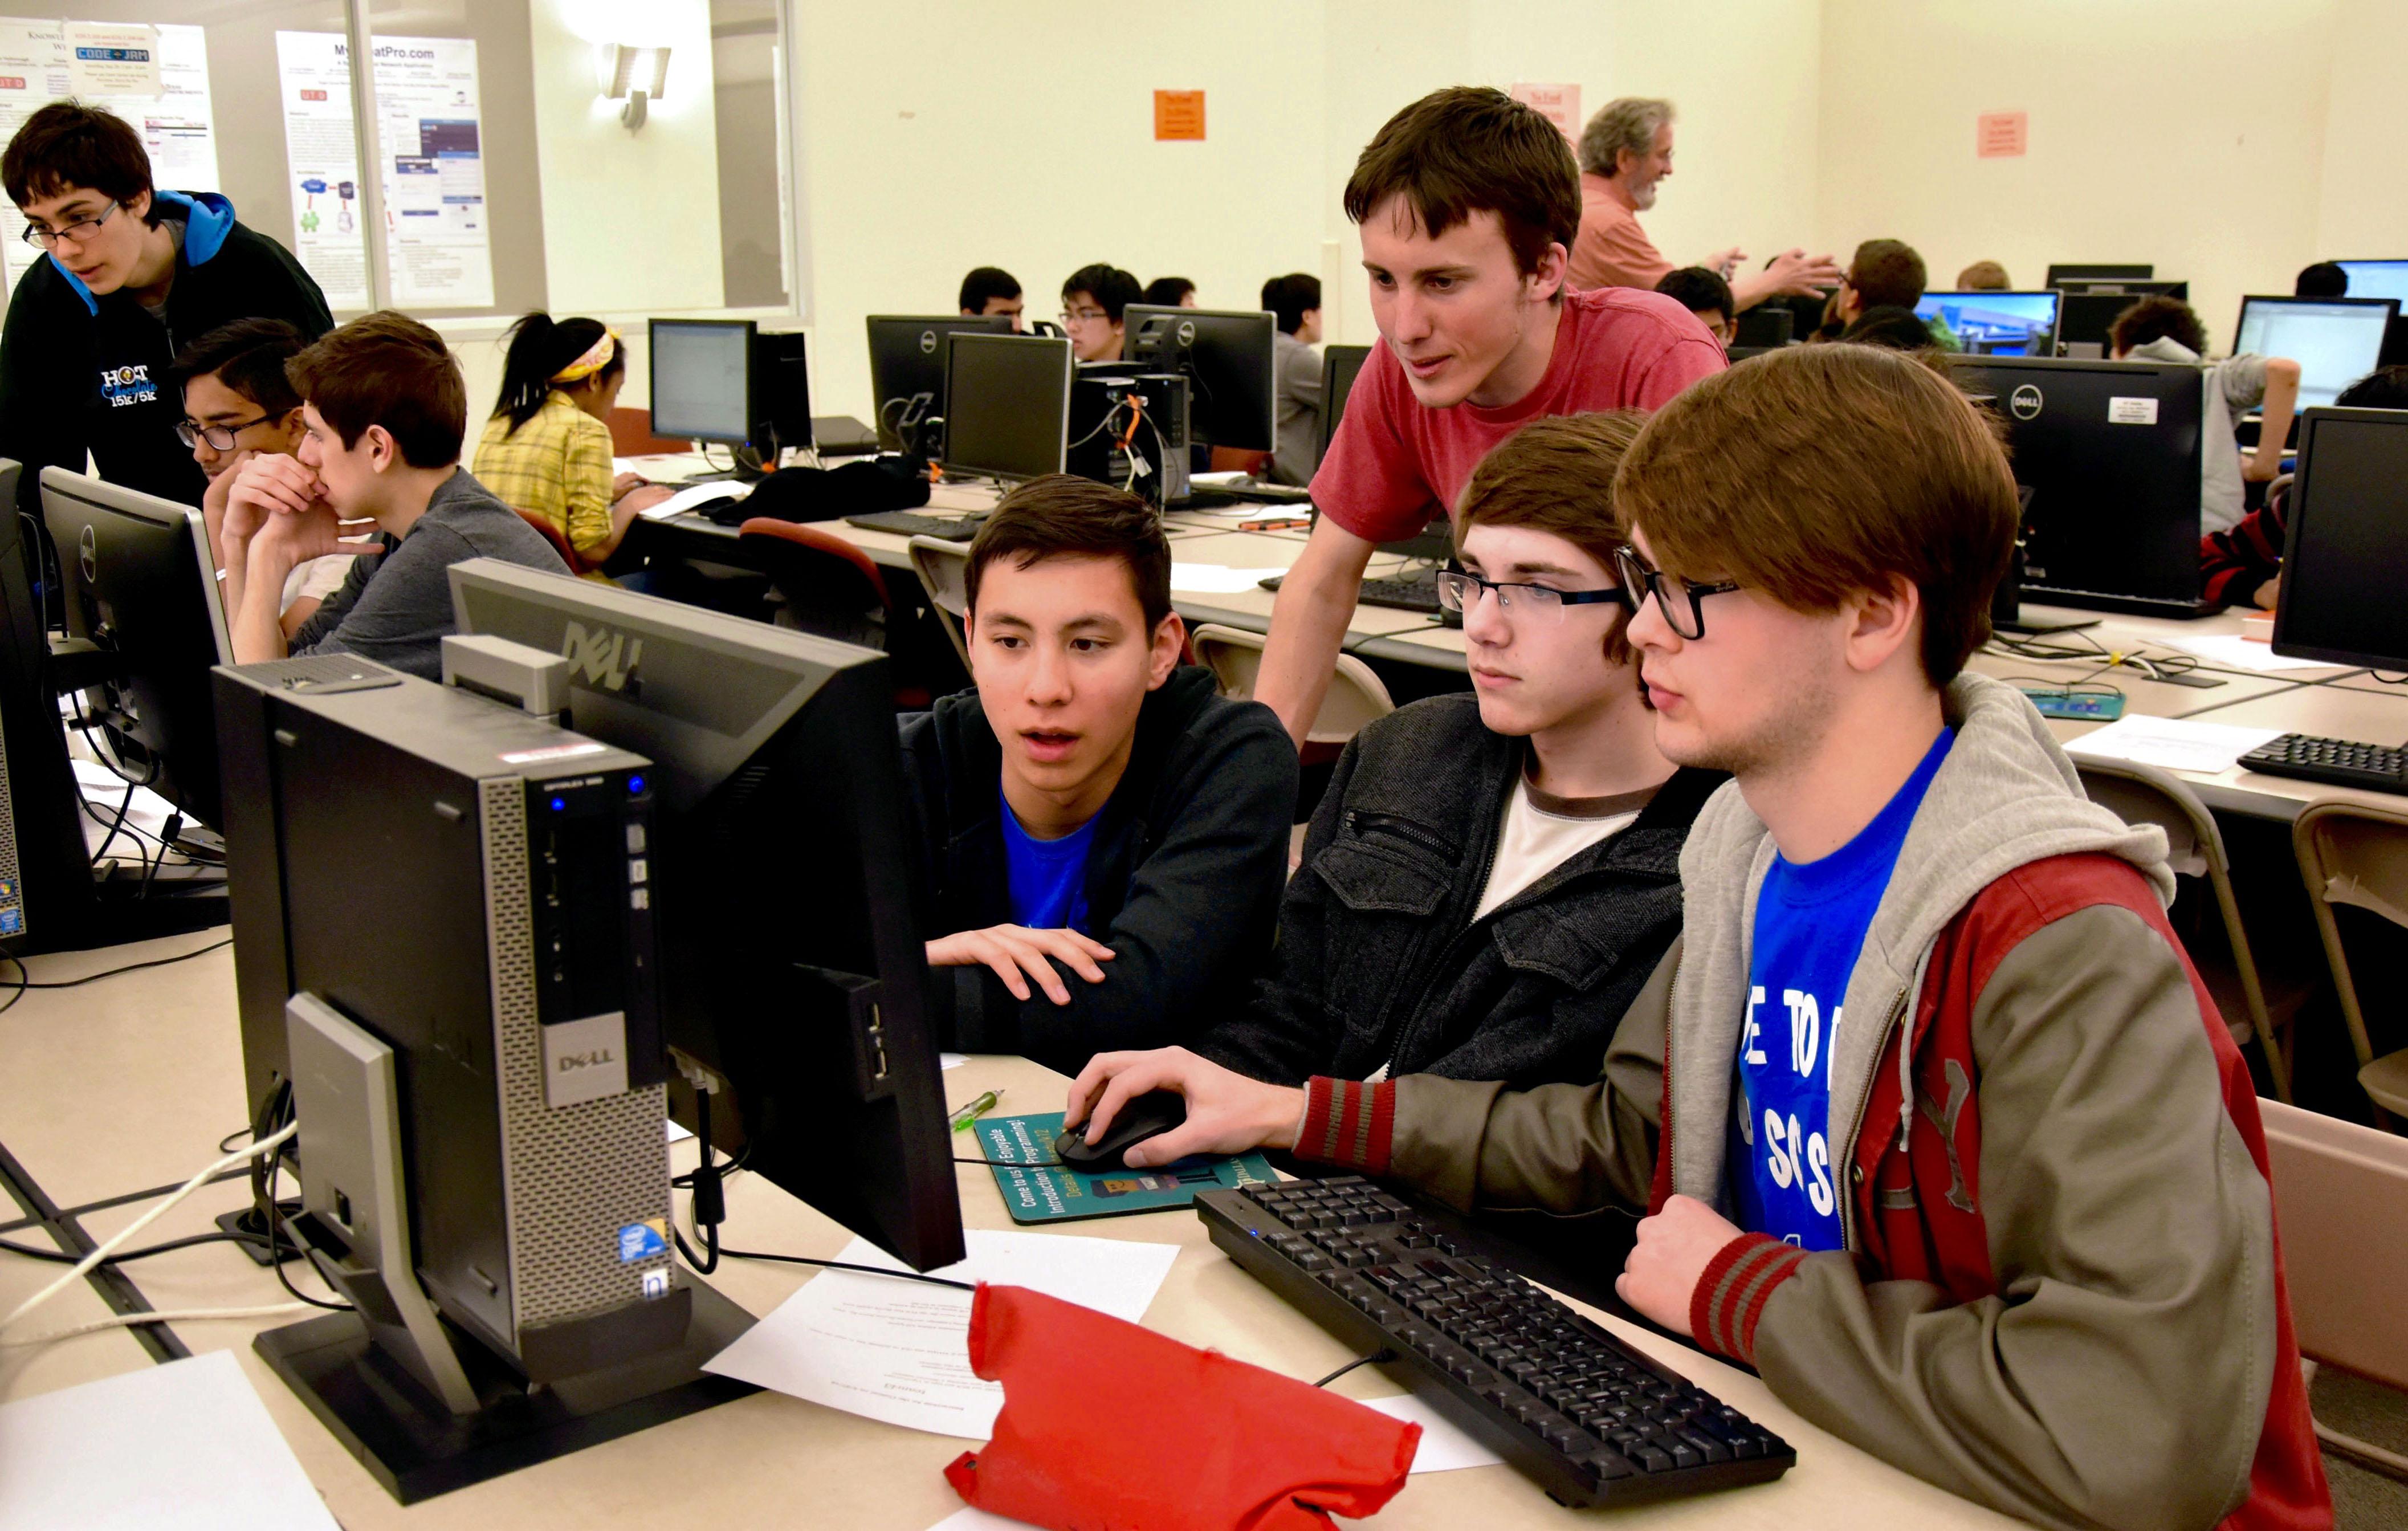 Utd Summer Research Program For High School Students - cs ... - photo#48